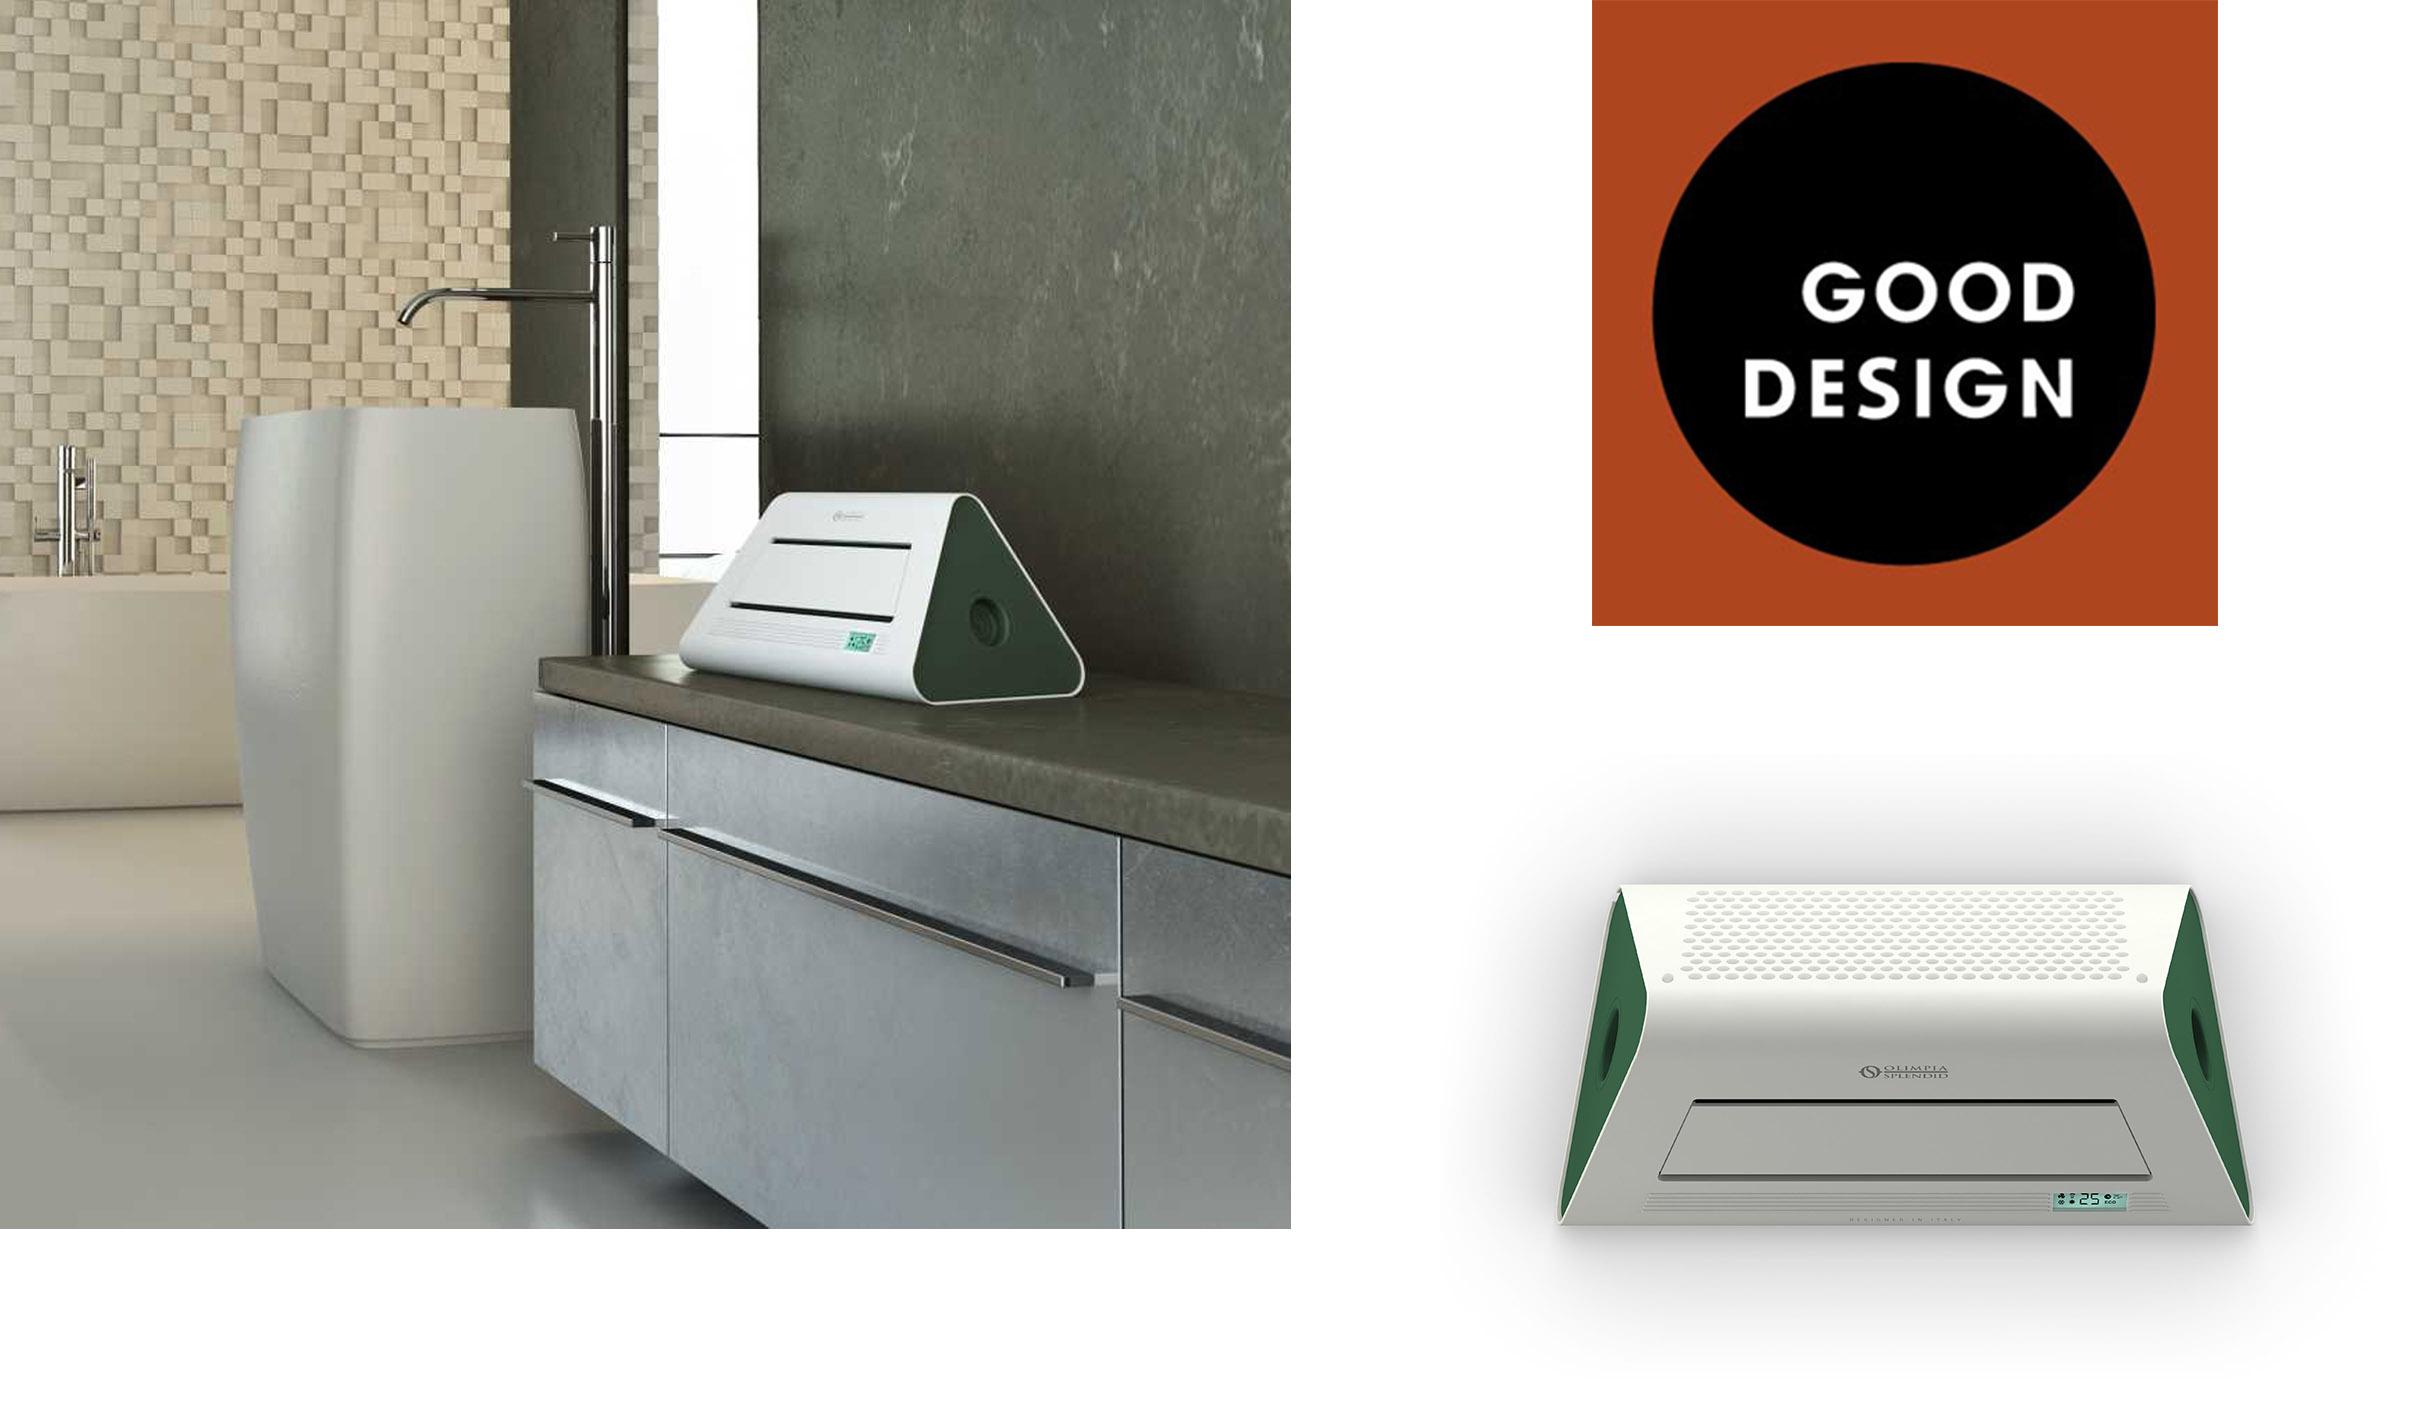 design olimpia splendid. Black Bedroom Furniture Sets. Home Design Ideas